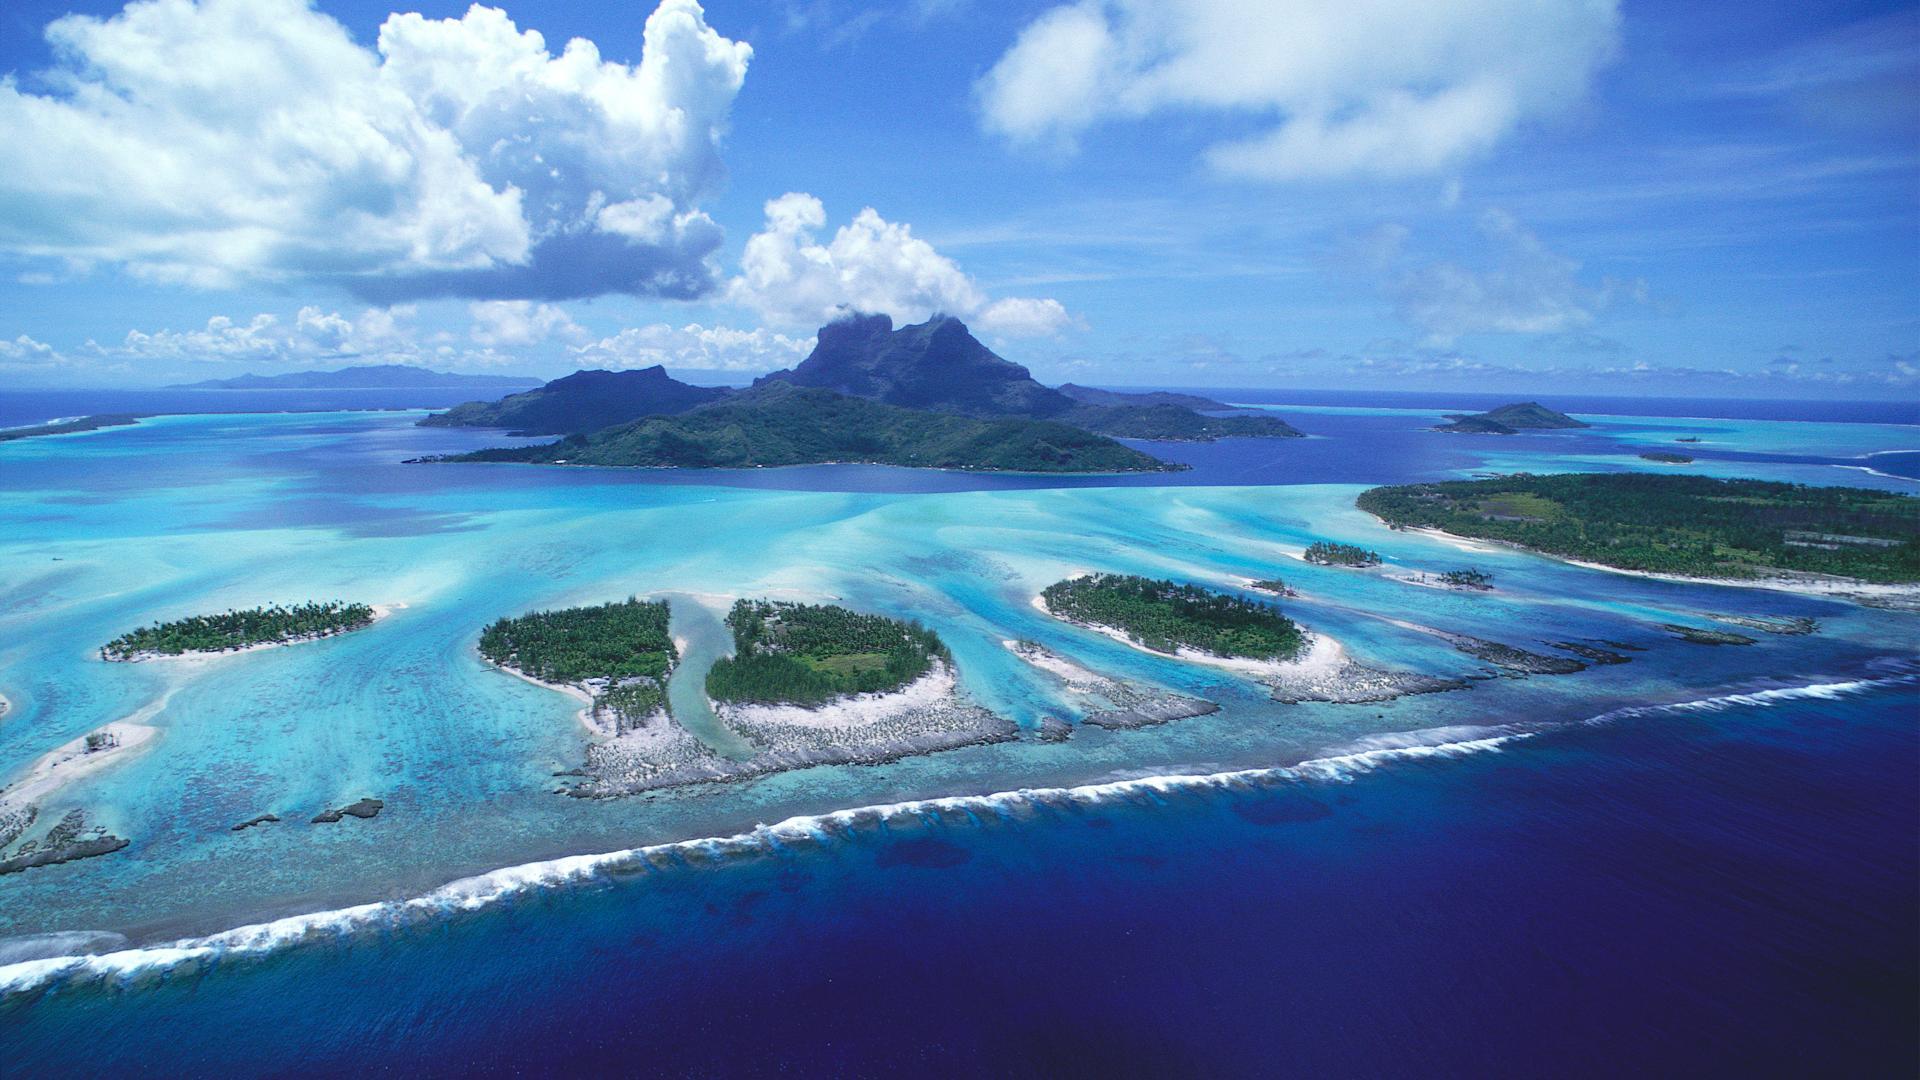 Bora Bora Beach Stunning Wallpaper   Travel HD Wallpapers 1920x1080